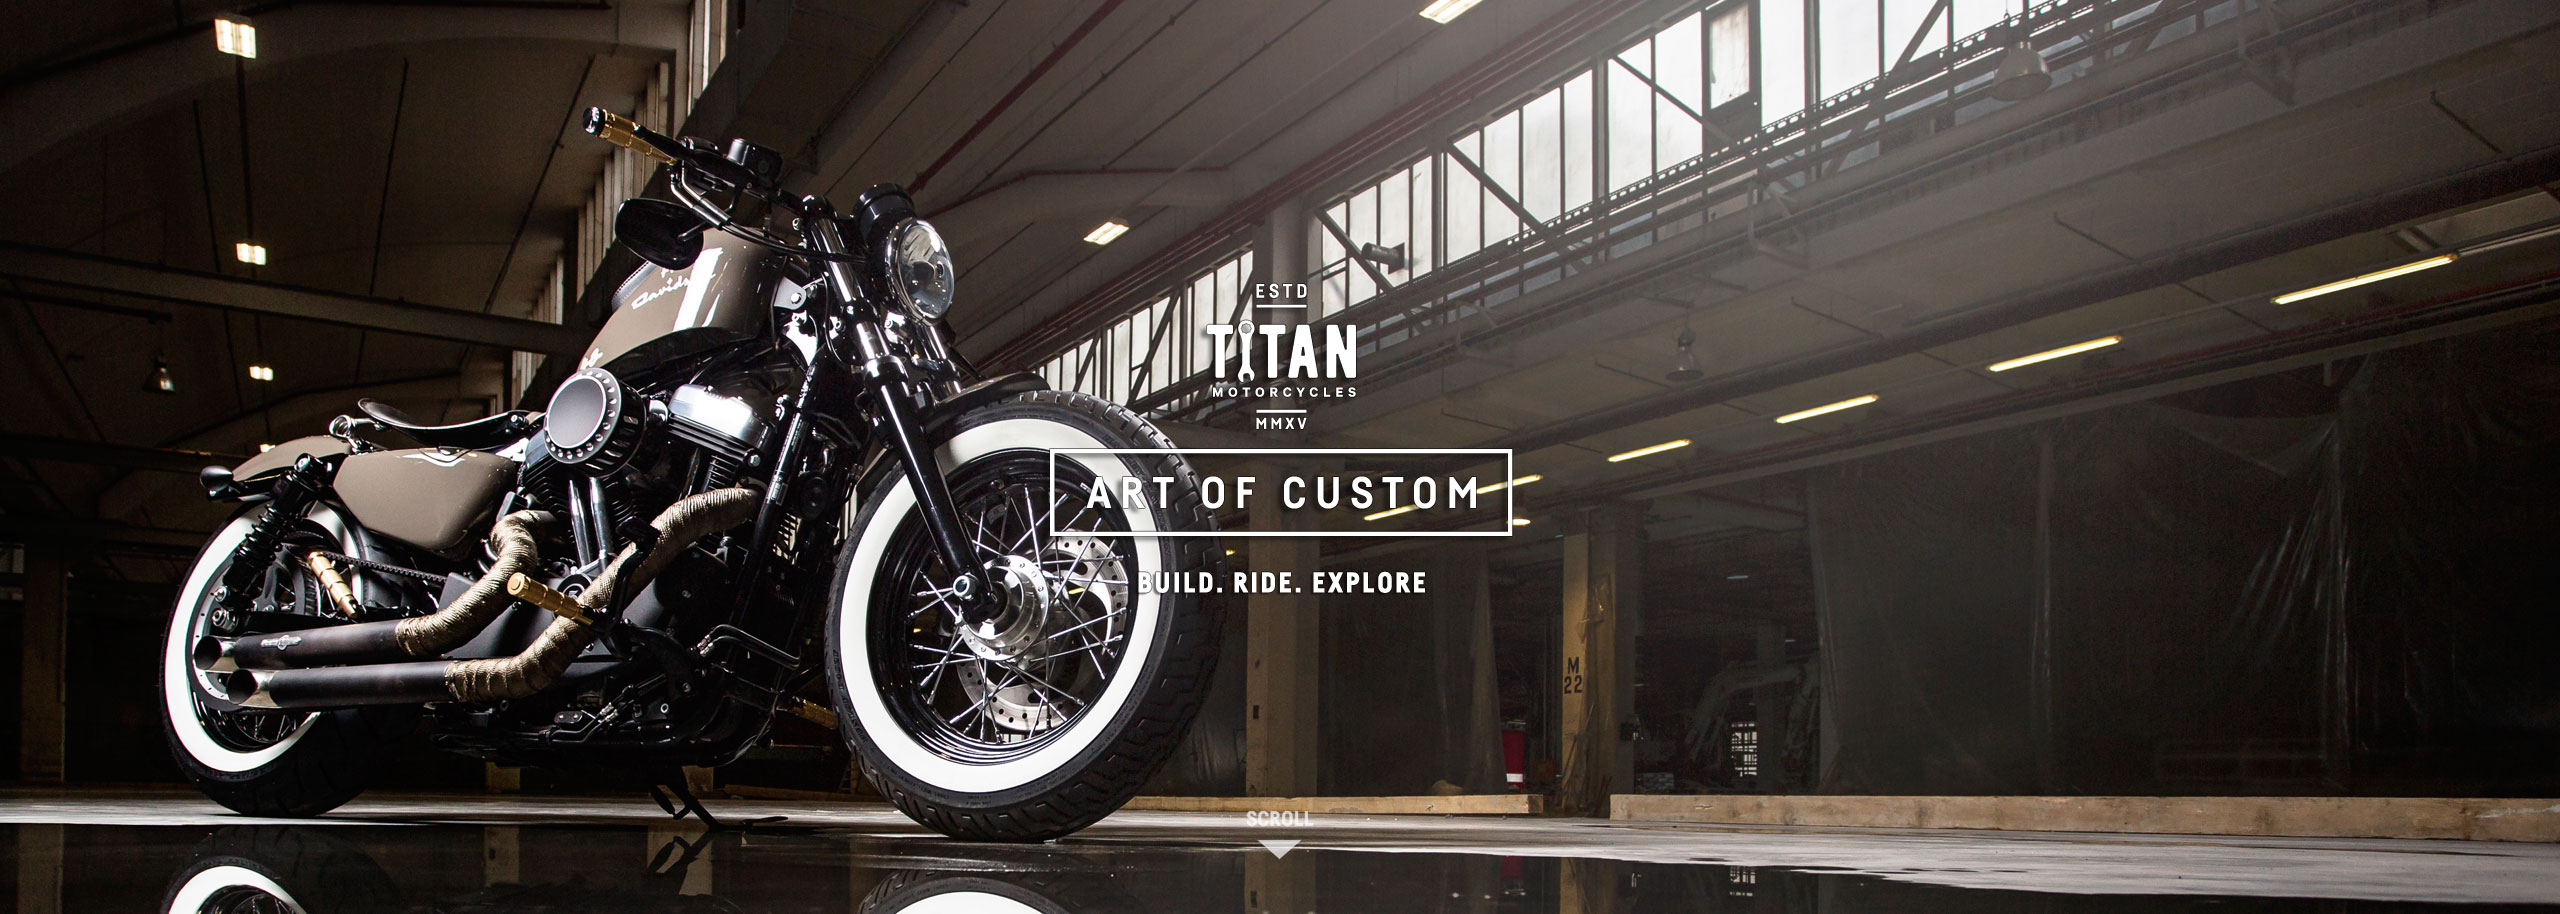 01_TITAN-Harley-Davidson-Umbau-Sportster-48-Cafe-Racer-Graz-Motorrad-Umbau-Austria-Vintage_Custom-Bikes_Motorrad-Umbauten